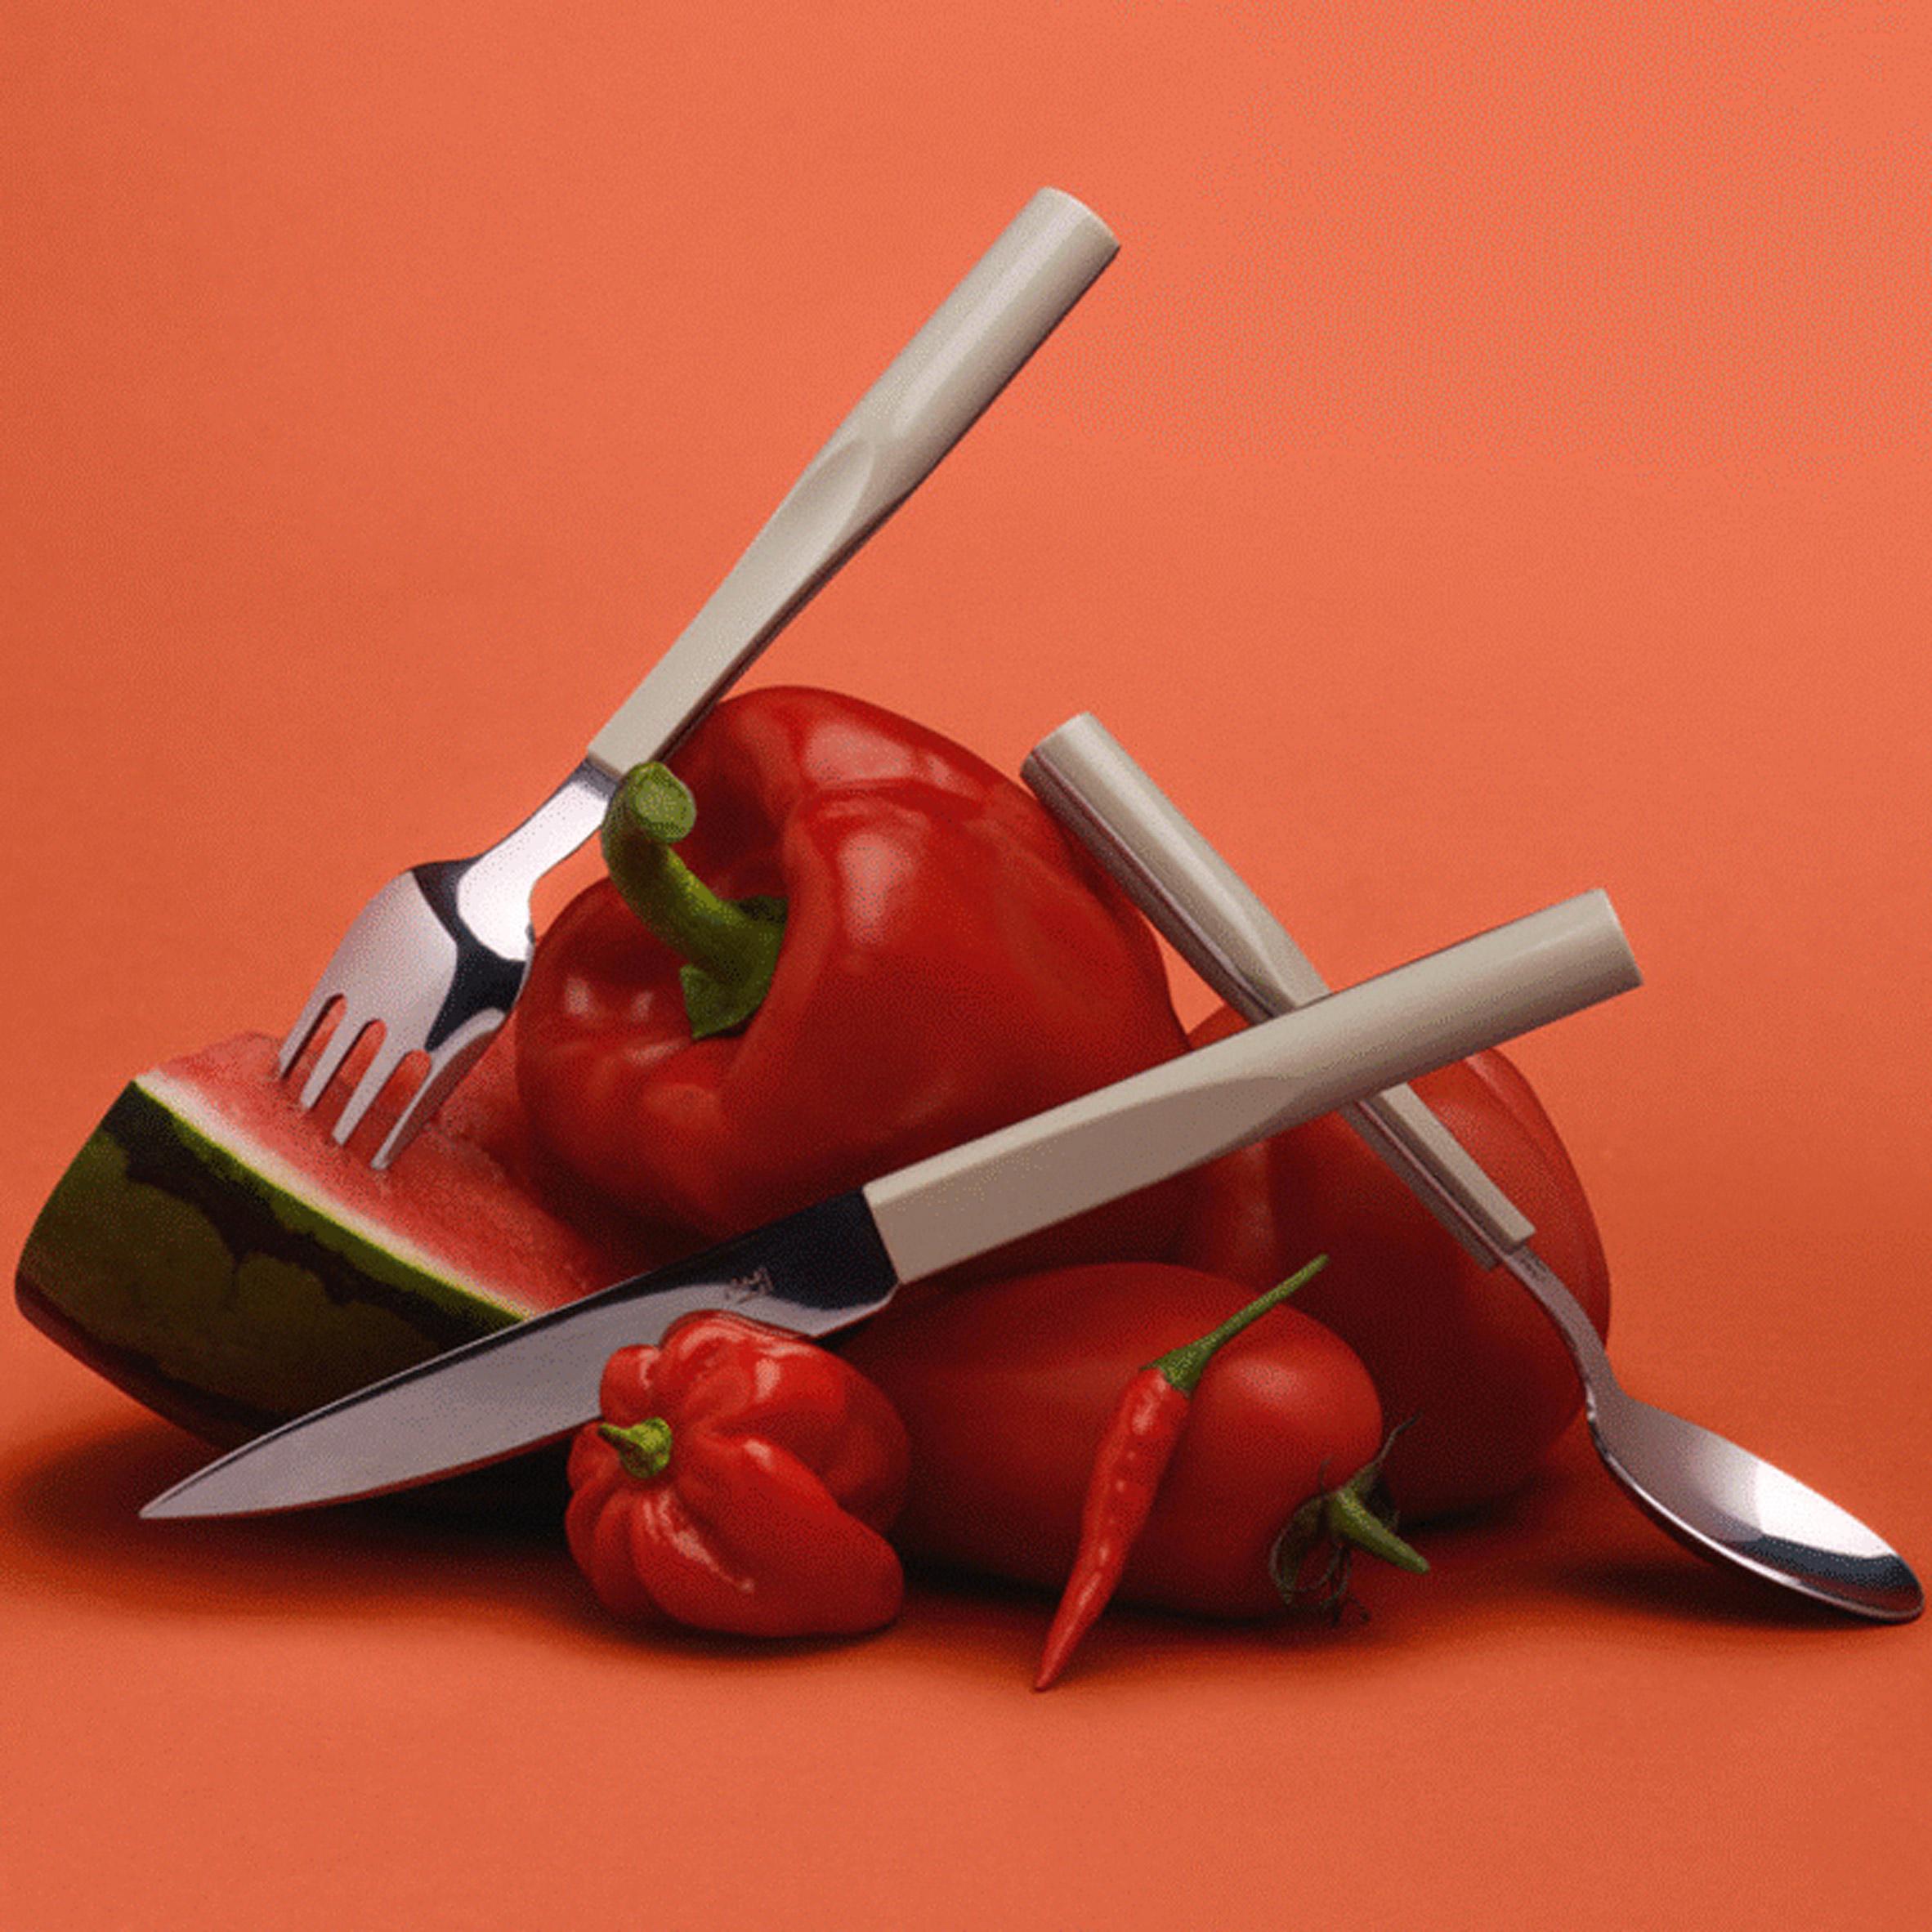 Philippe starck designs range of cutlery for degrenne for Starck philippe